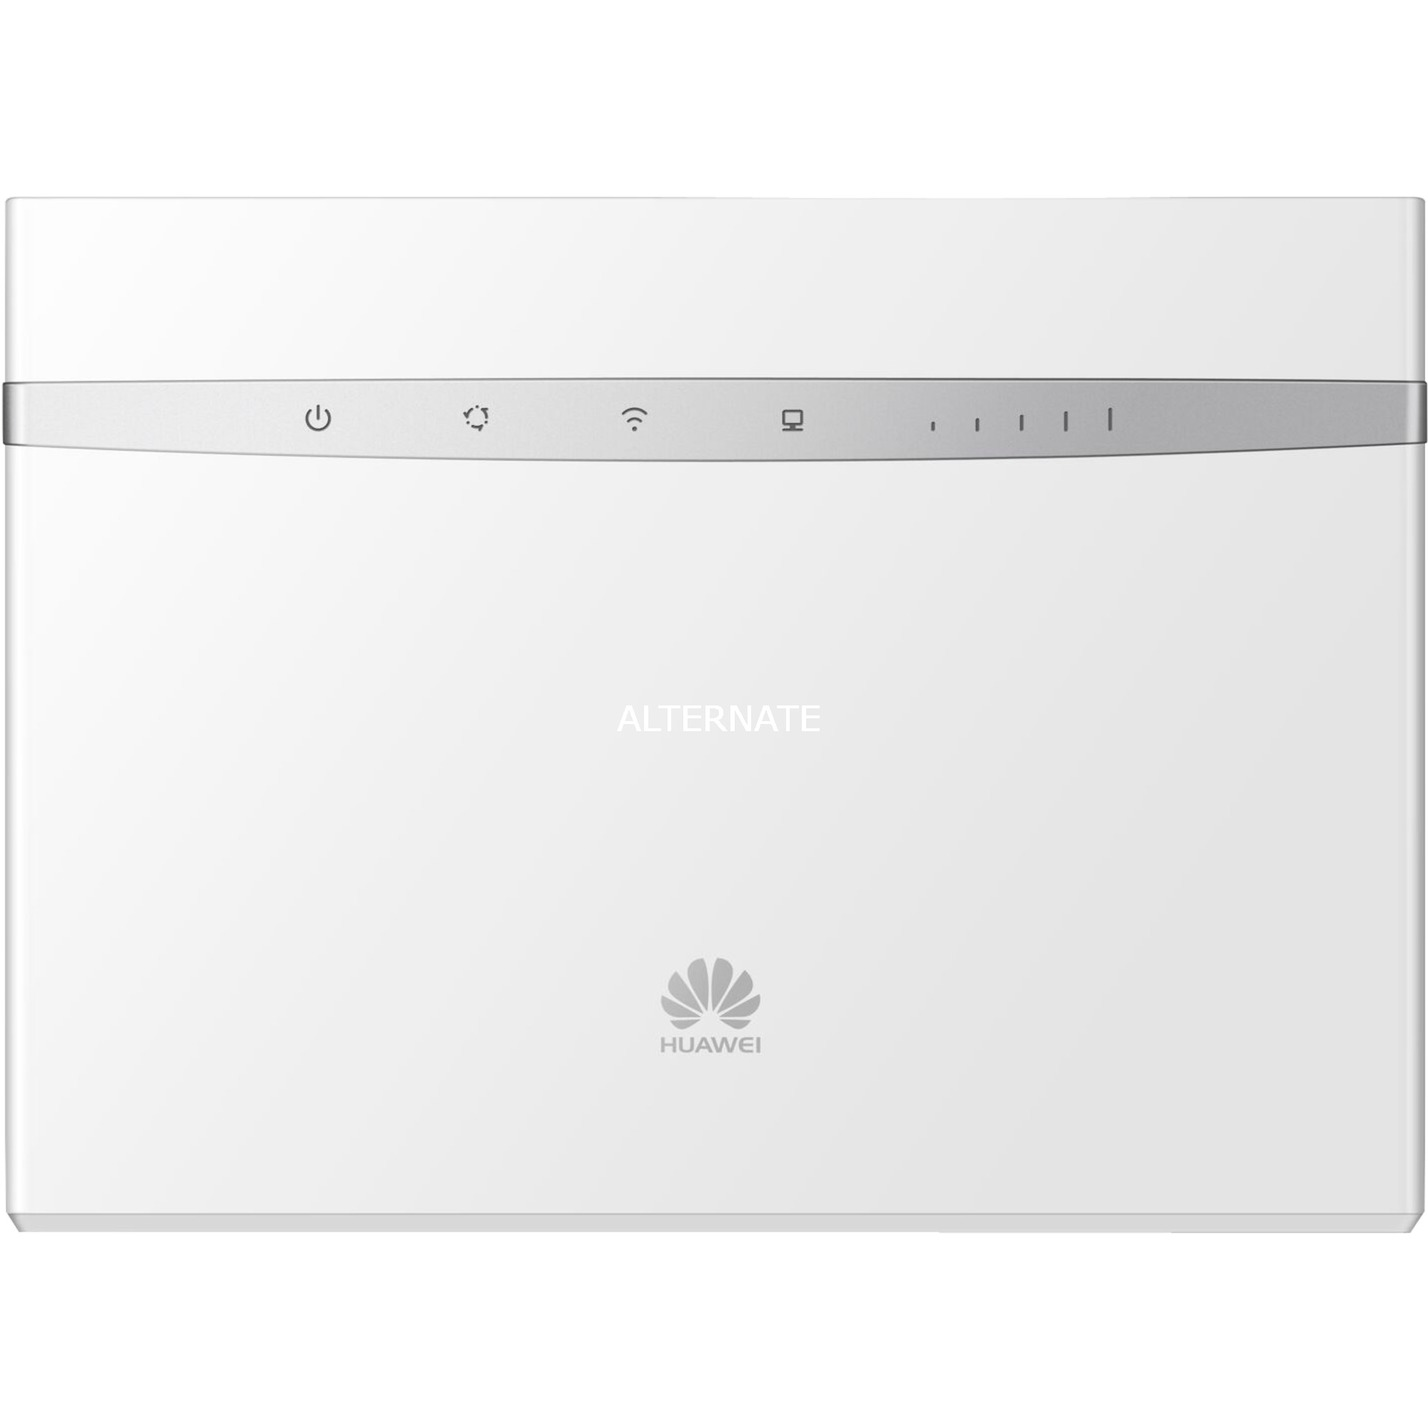 B525 router inalámbrico Doble banda (2,4 GHz / 5 GHz) Gigabit Ethernet 3G 4G Blanco